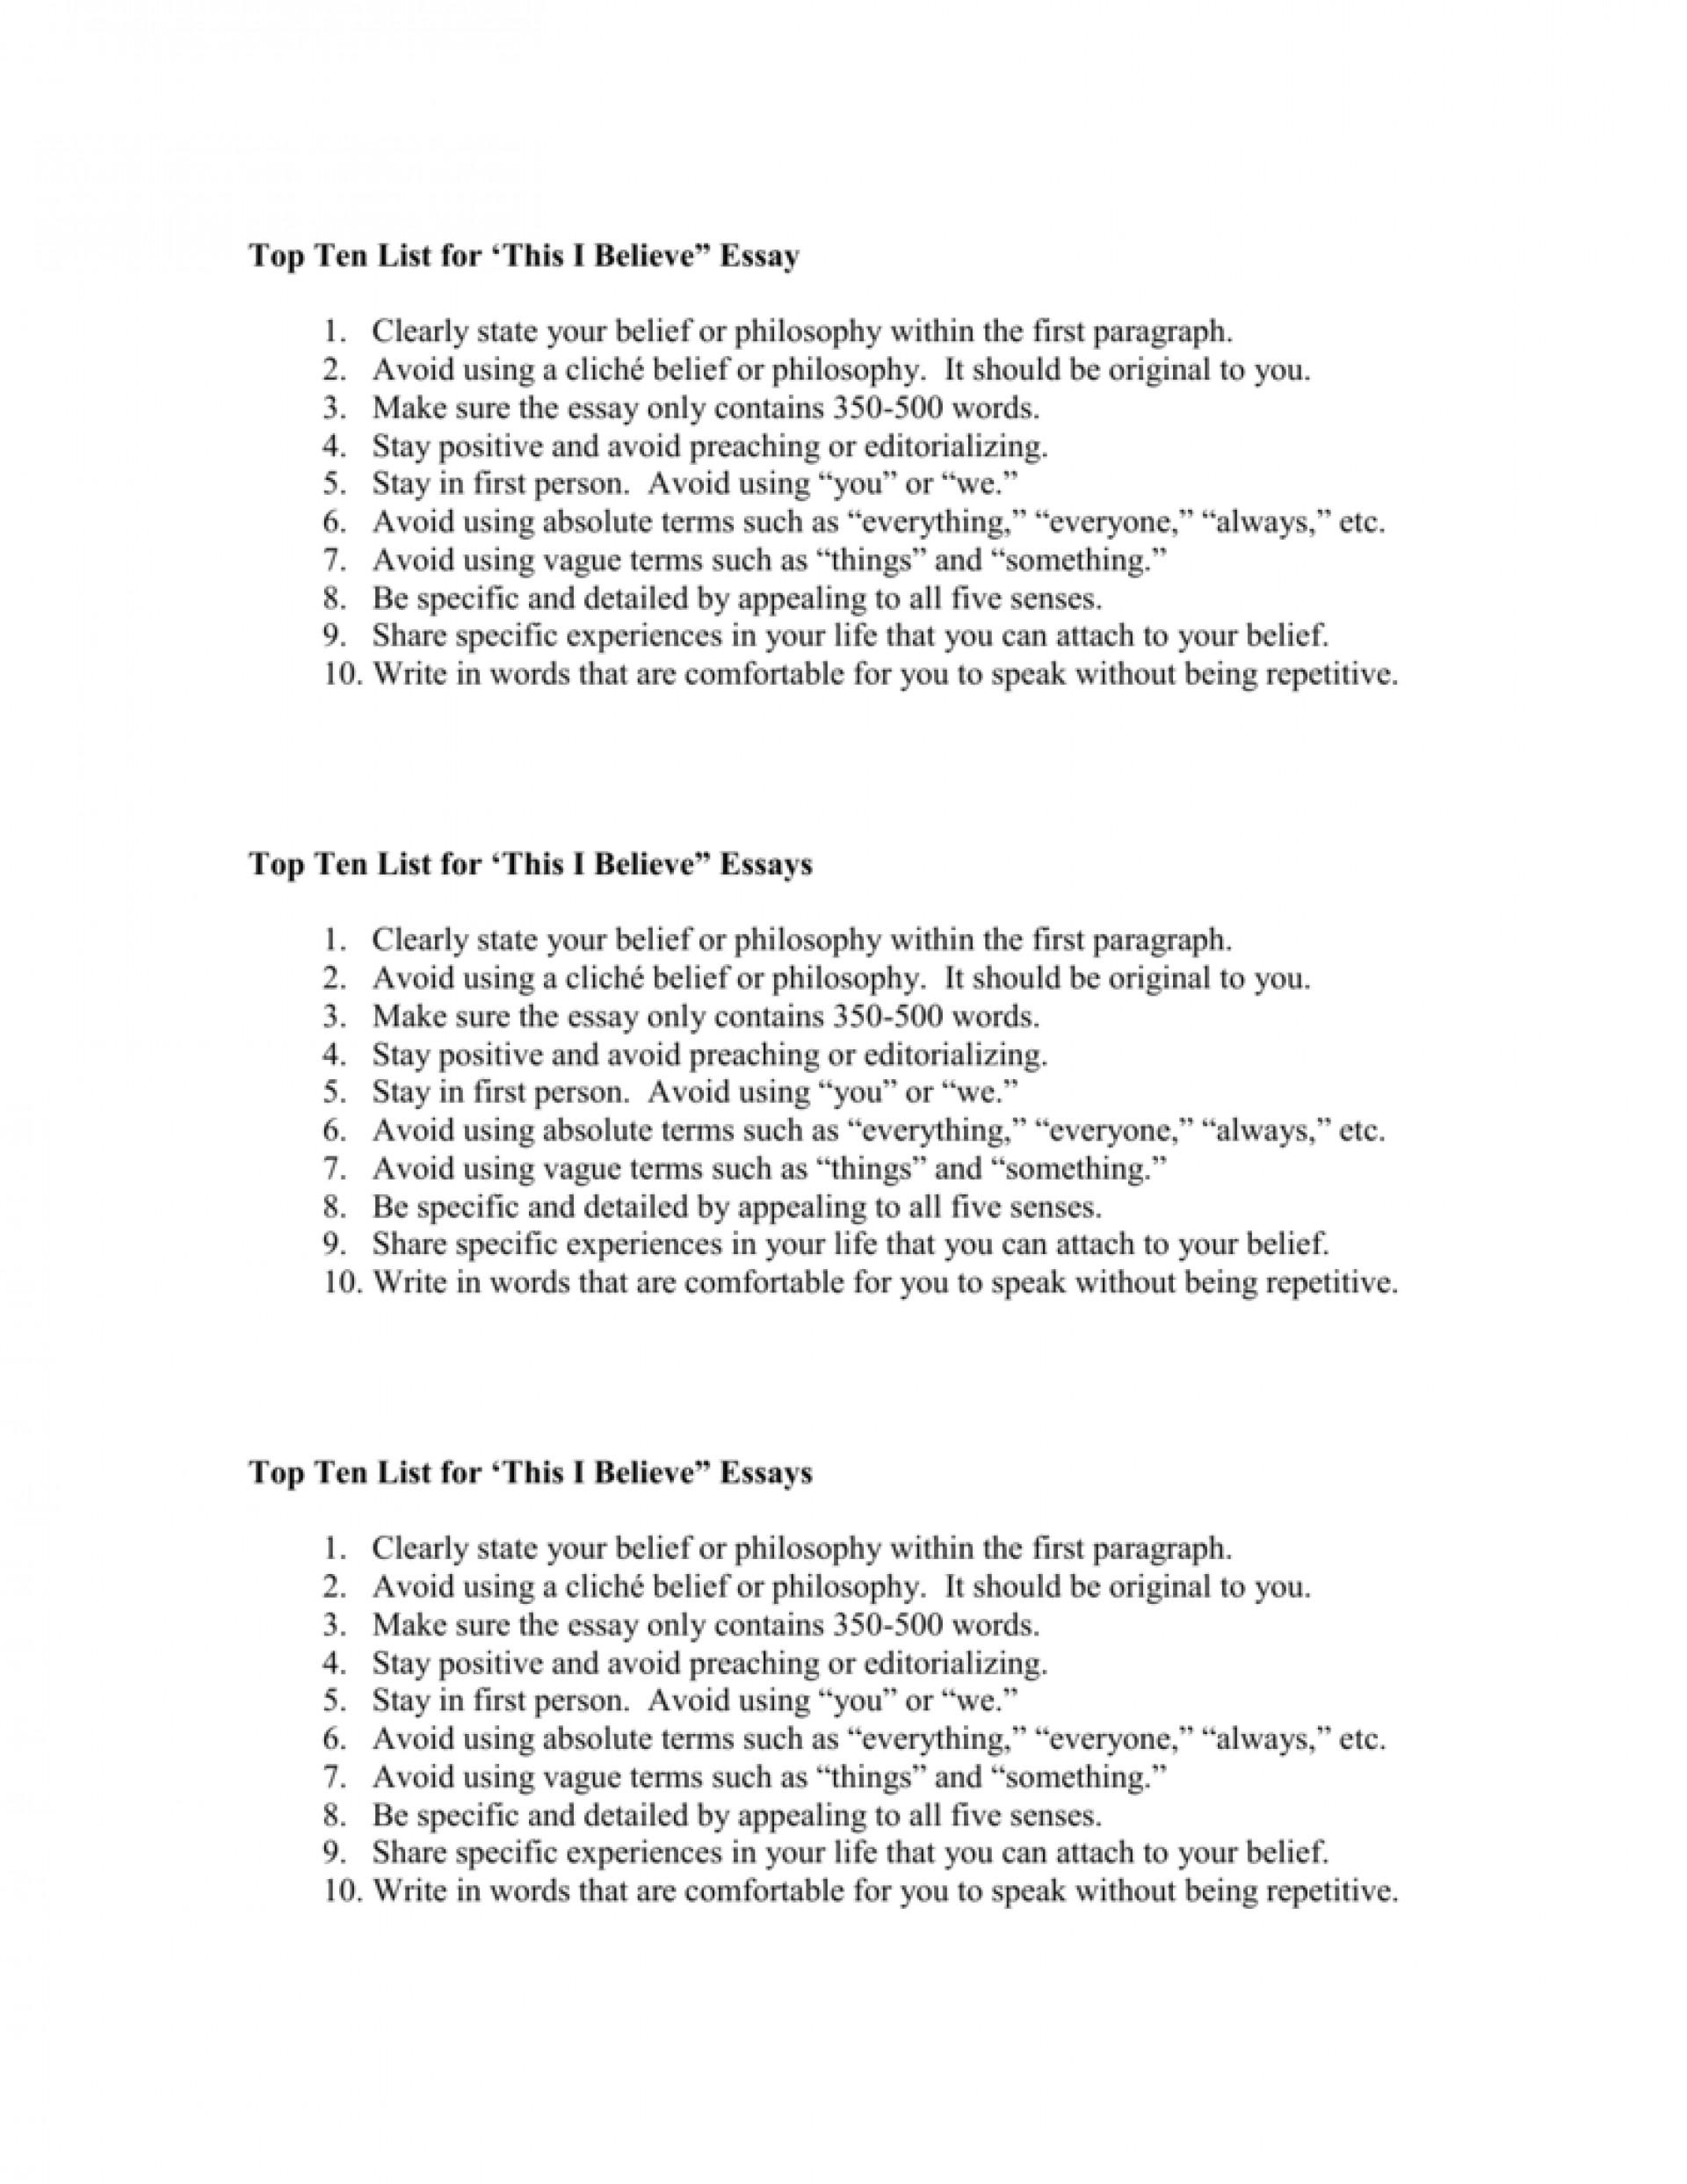 008 I Belive Essays 007293020 1 Essay Surprising Believe About Sports Ideas 1920